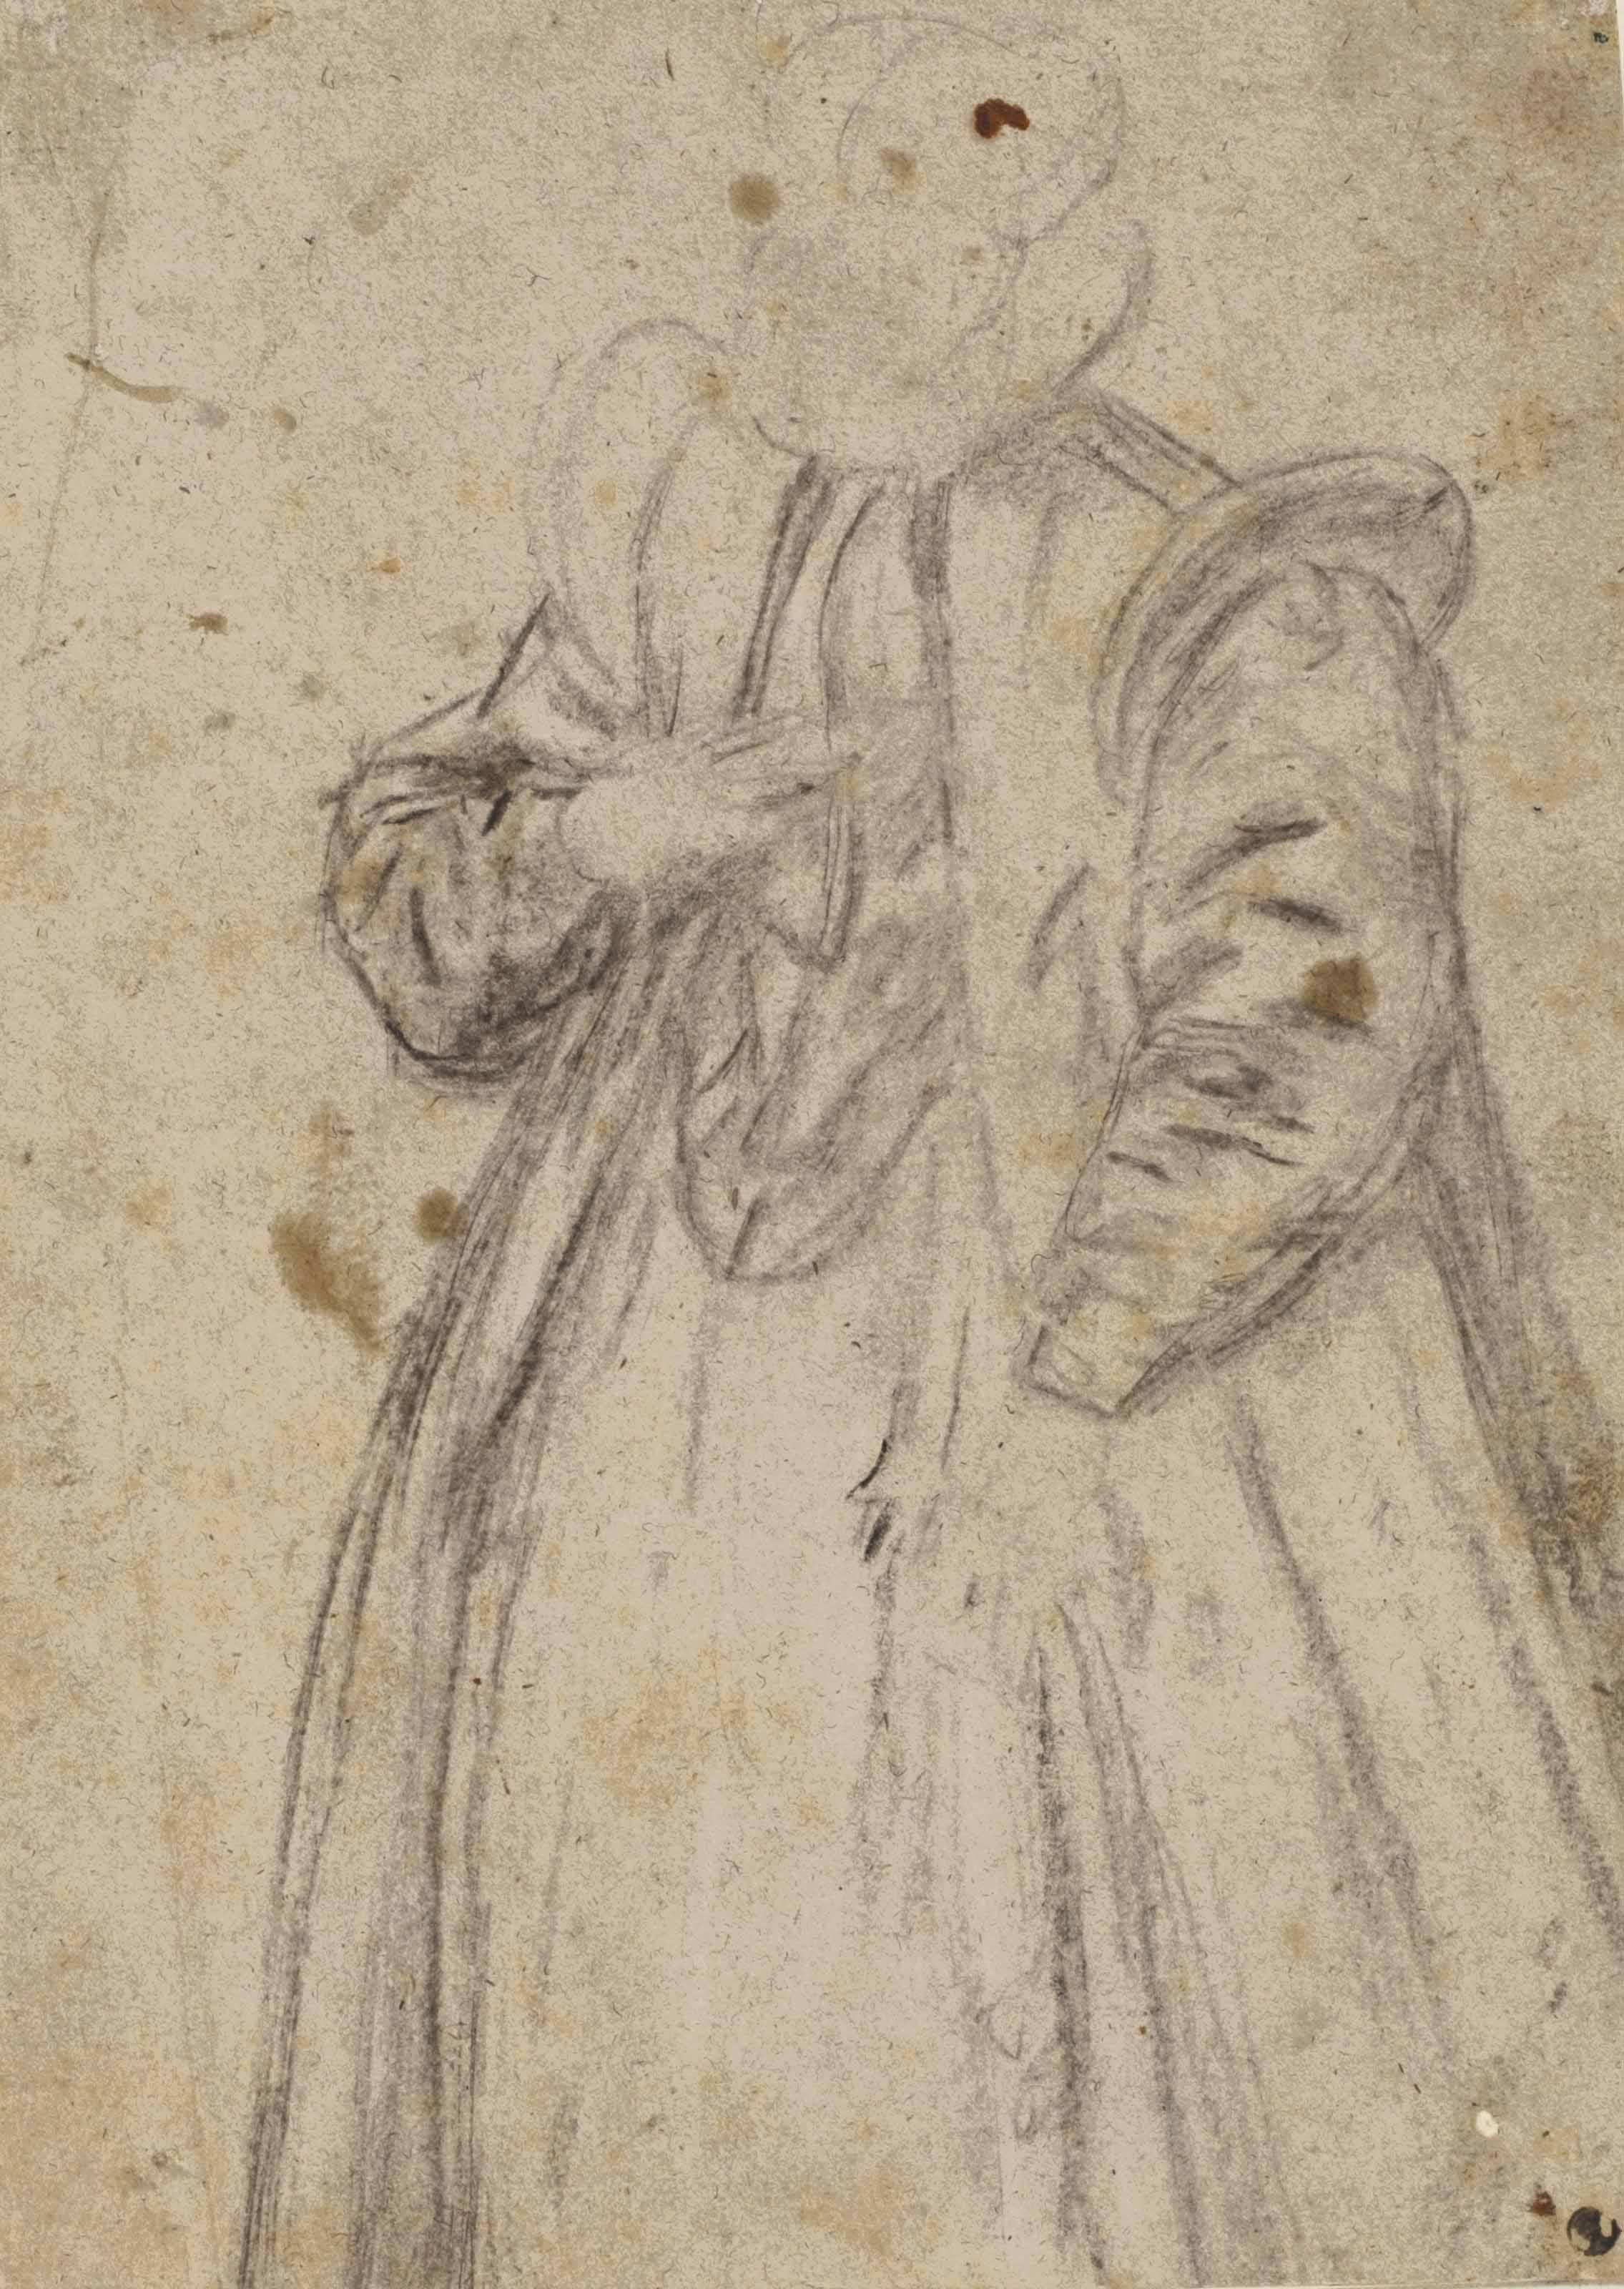 Attributed to Cornelis Ketel (Gouda 1548-1616 Amsterdam)